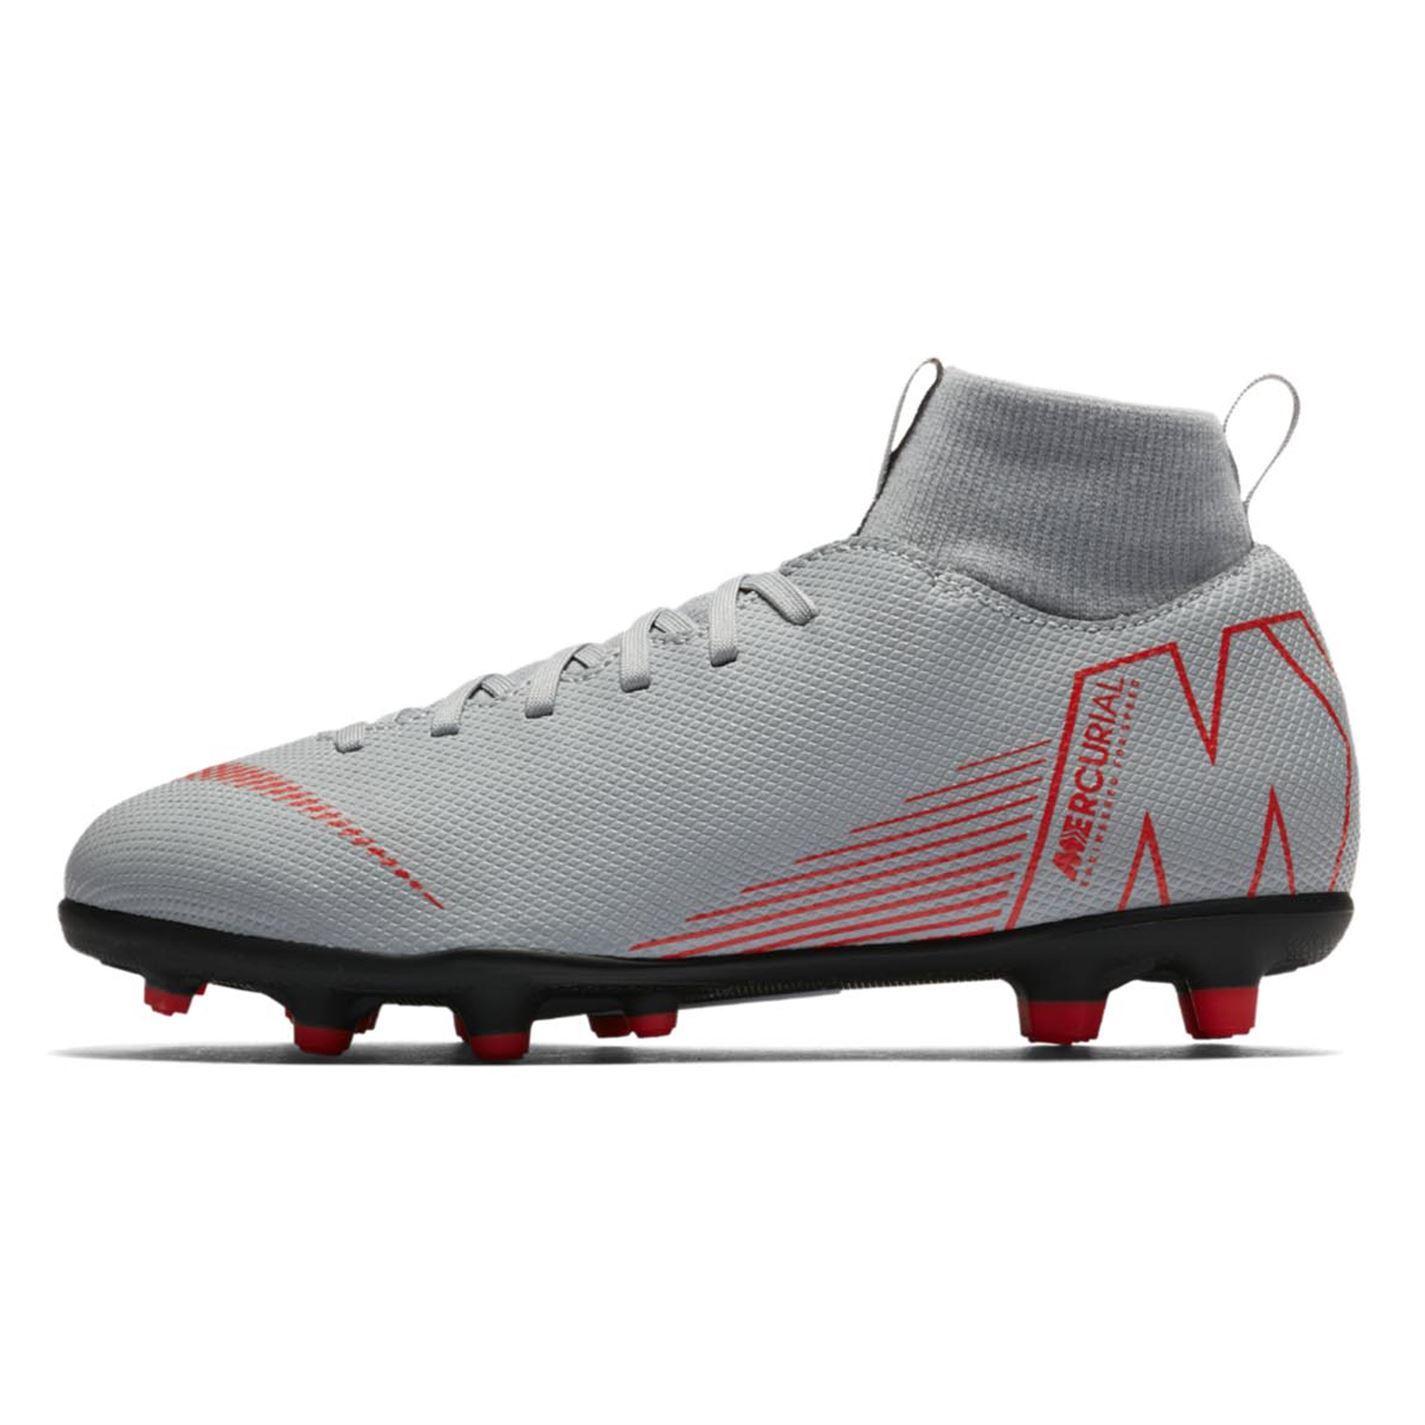 Nike-MERCURIAL-SUPERFLY-Club-DF-TERRA-FERMA-SCARPE-DA-CALCIO-JUNIOR-CALCIO-Cunei miniatura 8